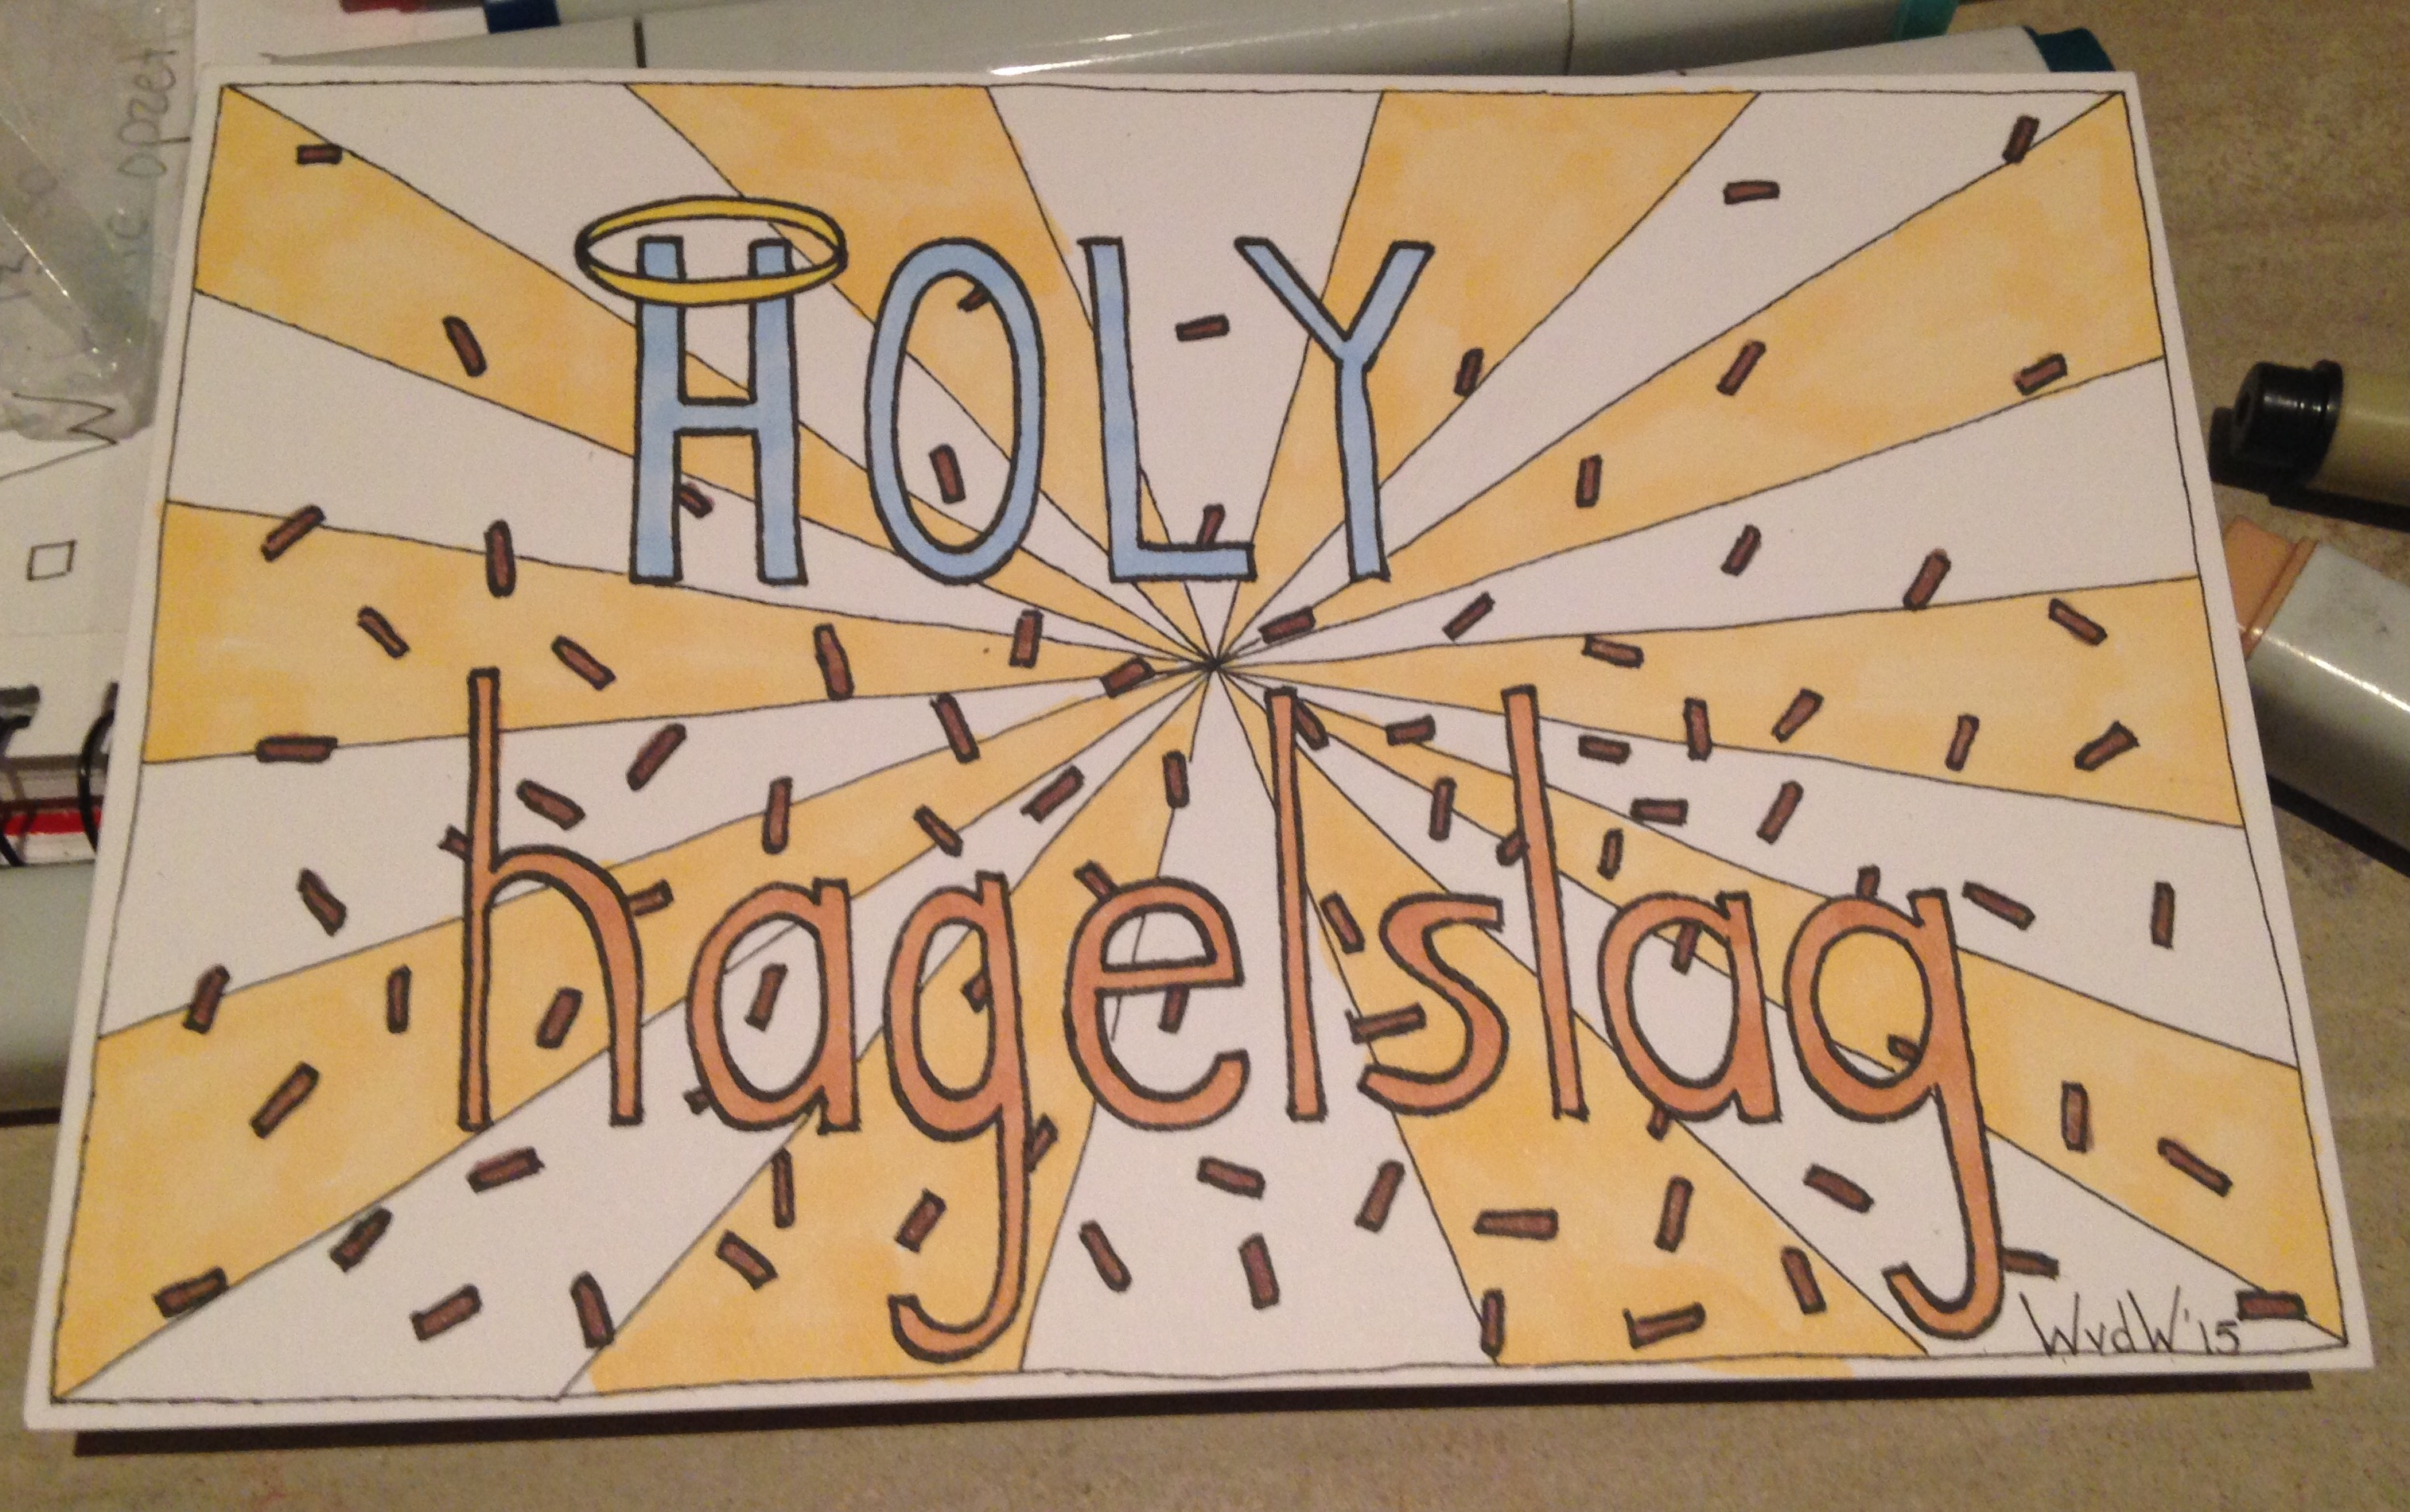 Holy hagelslag